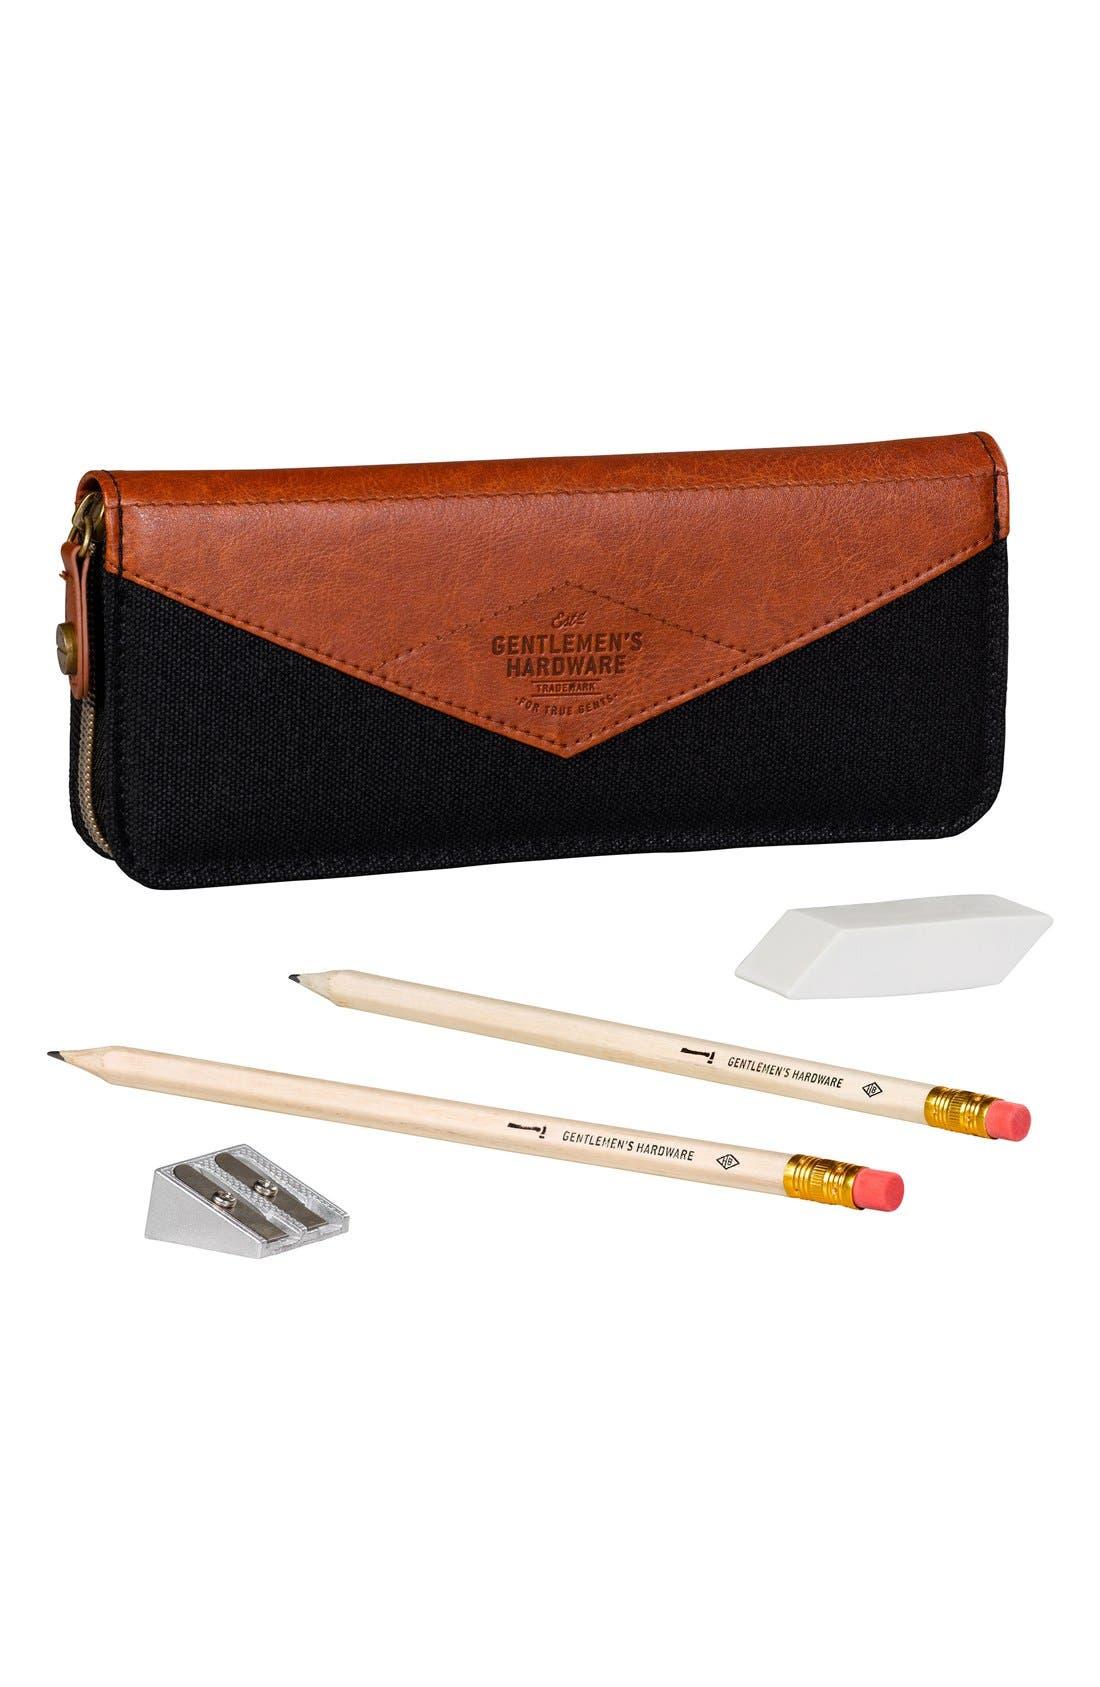 Alternate Image 1 Selected - Wild and Wolf Gentlemen's Hardware Pencil Case, Pencils, Sharpener & Eraser